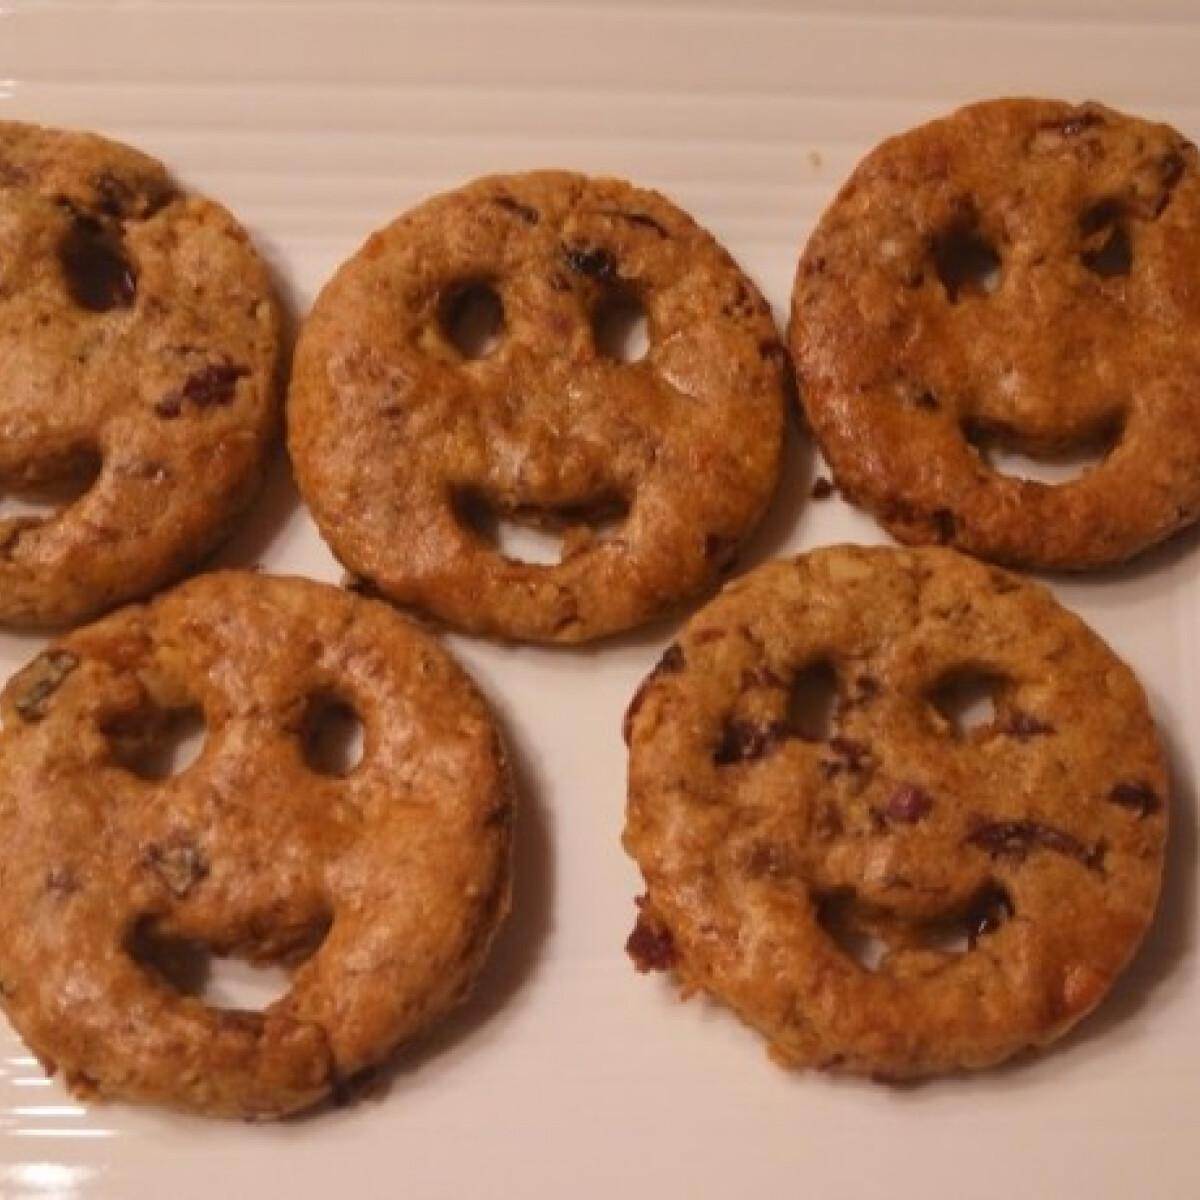 Mosolygós keksz